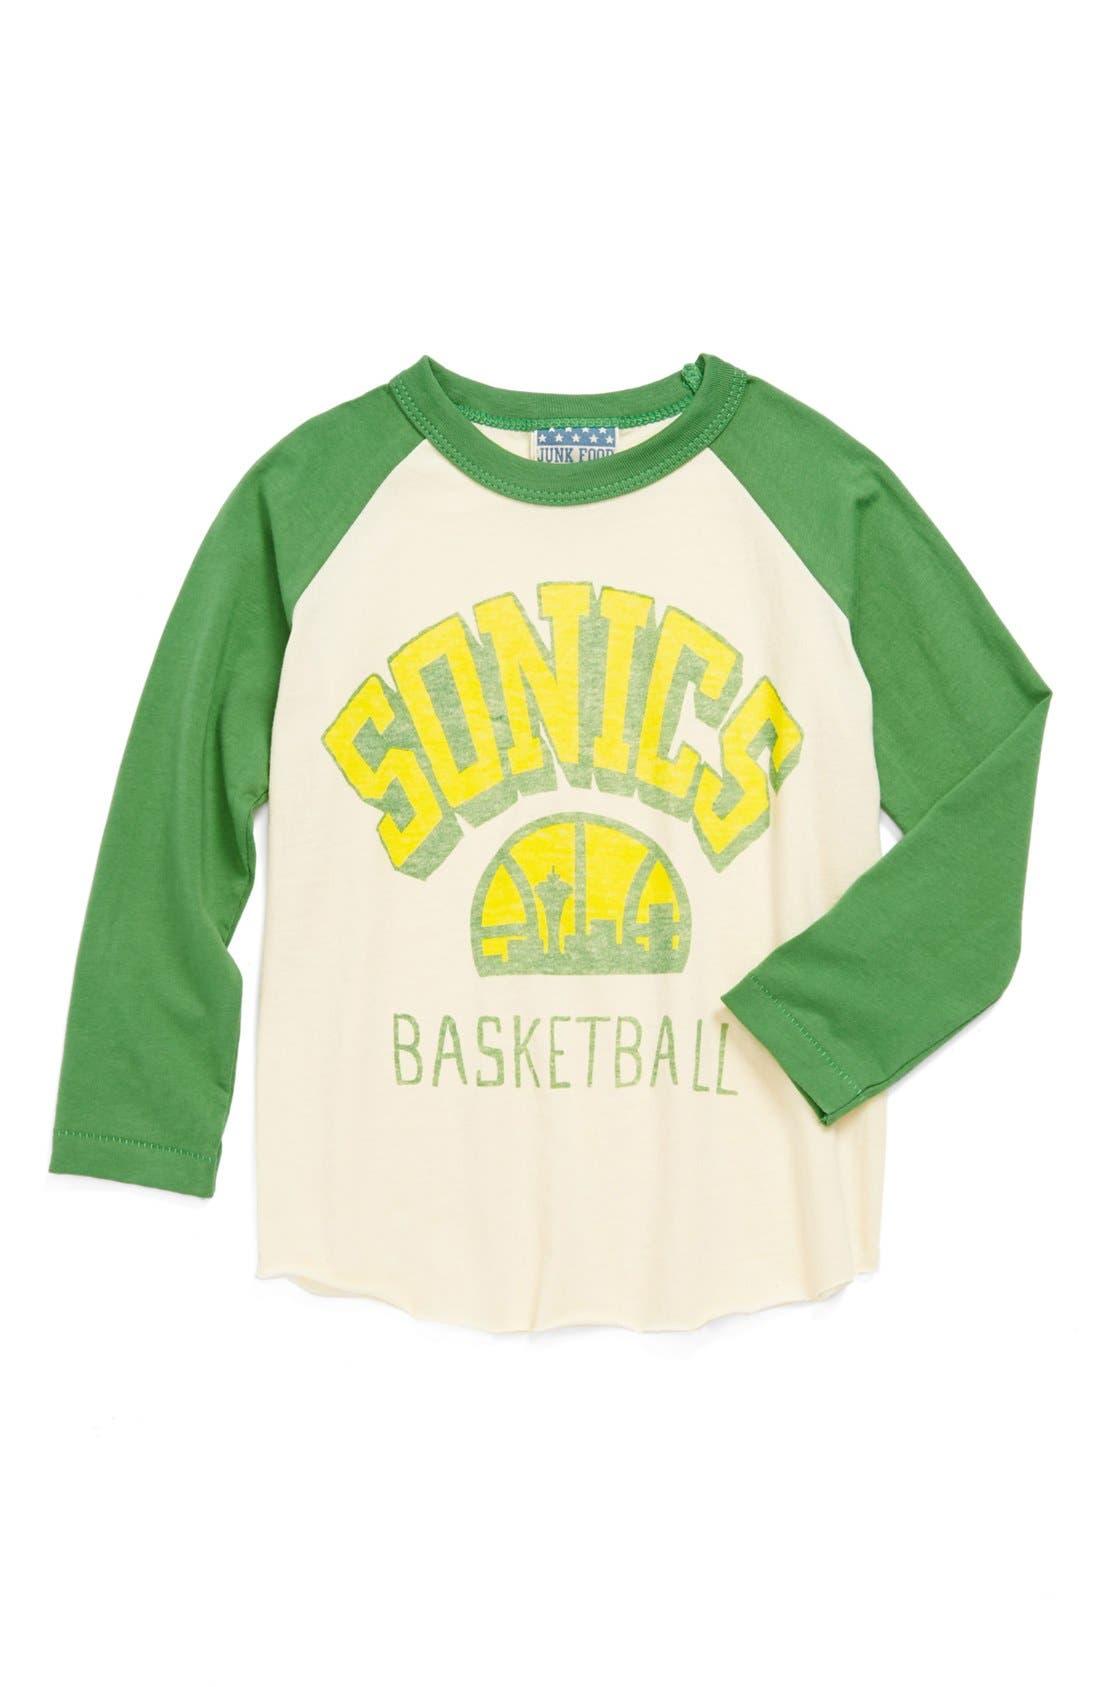 Main Image - Junk Food 'Seattle Sonics' Long Sleeve T-Shirt (Little Boys & Big Boys)